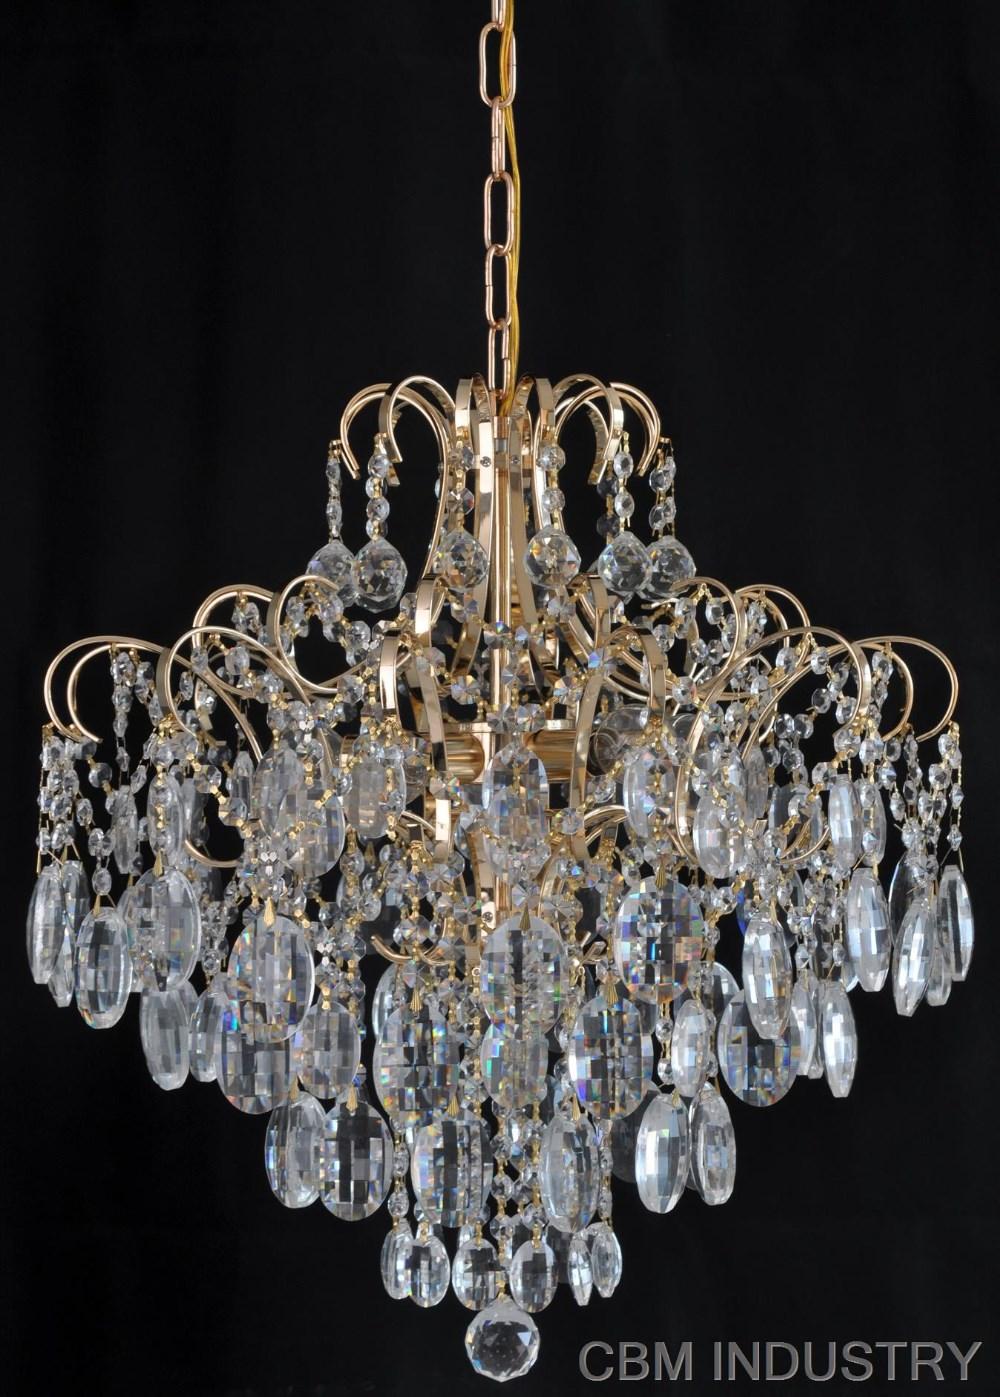 Chandelier prismslight chandelier specificationglass bubble chandelier buy chandelier prismslight chandelier specificationglass bubble